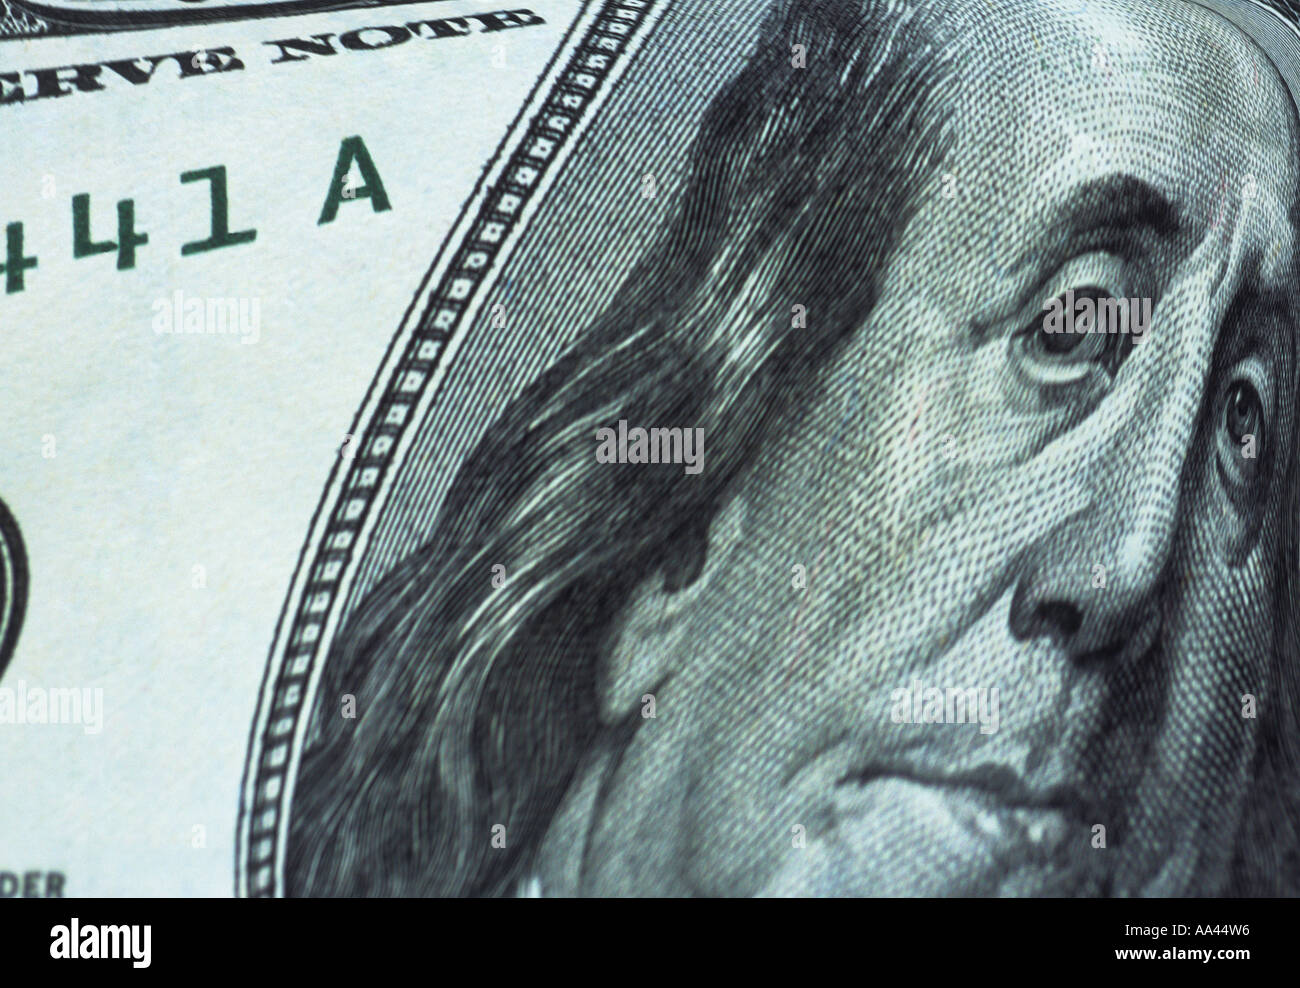 United States One Hundred Dollar Bill 100 - Stock Image